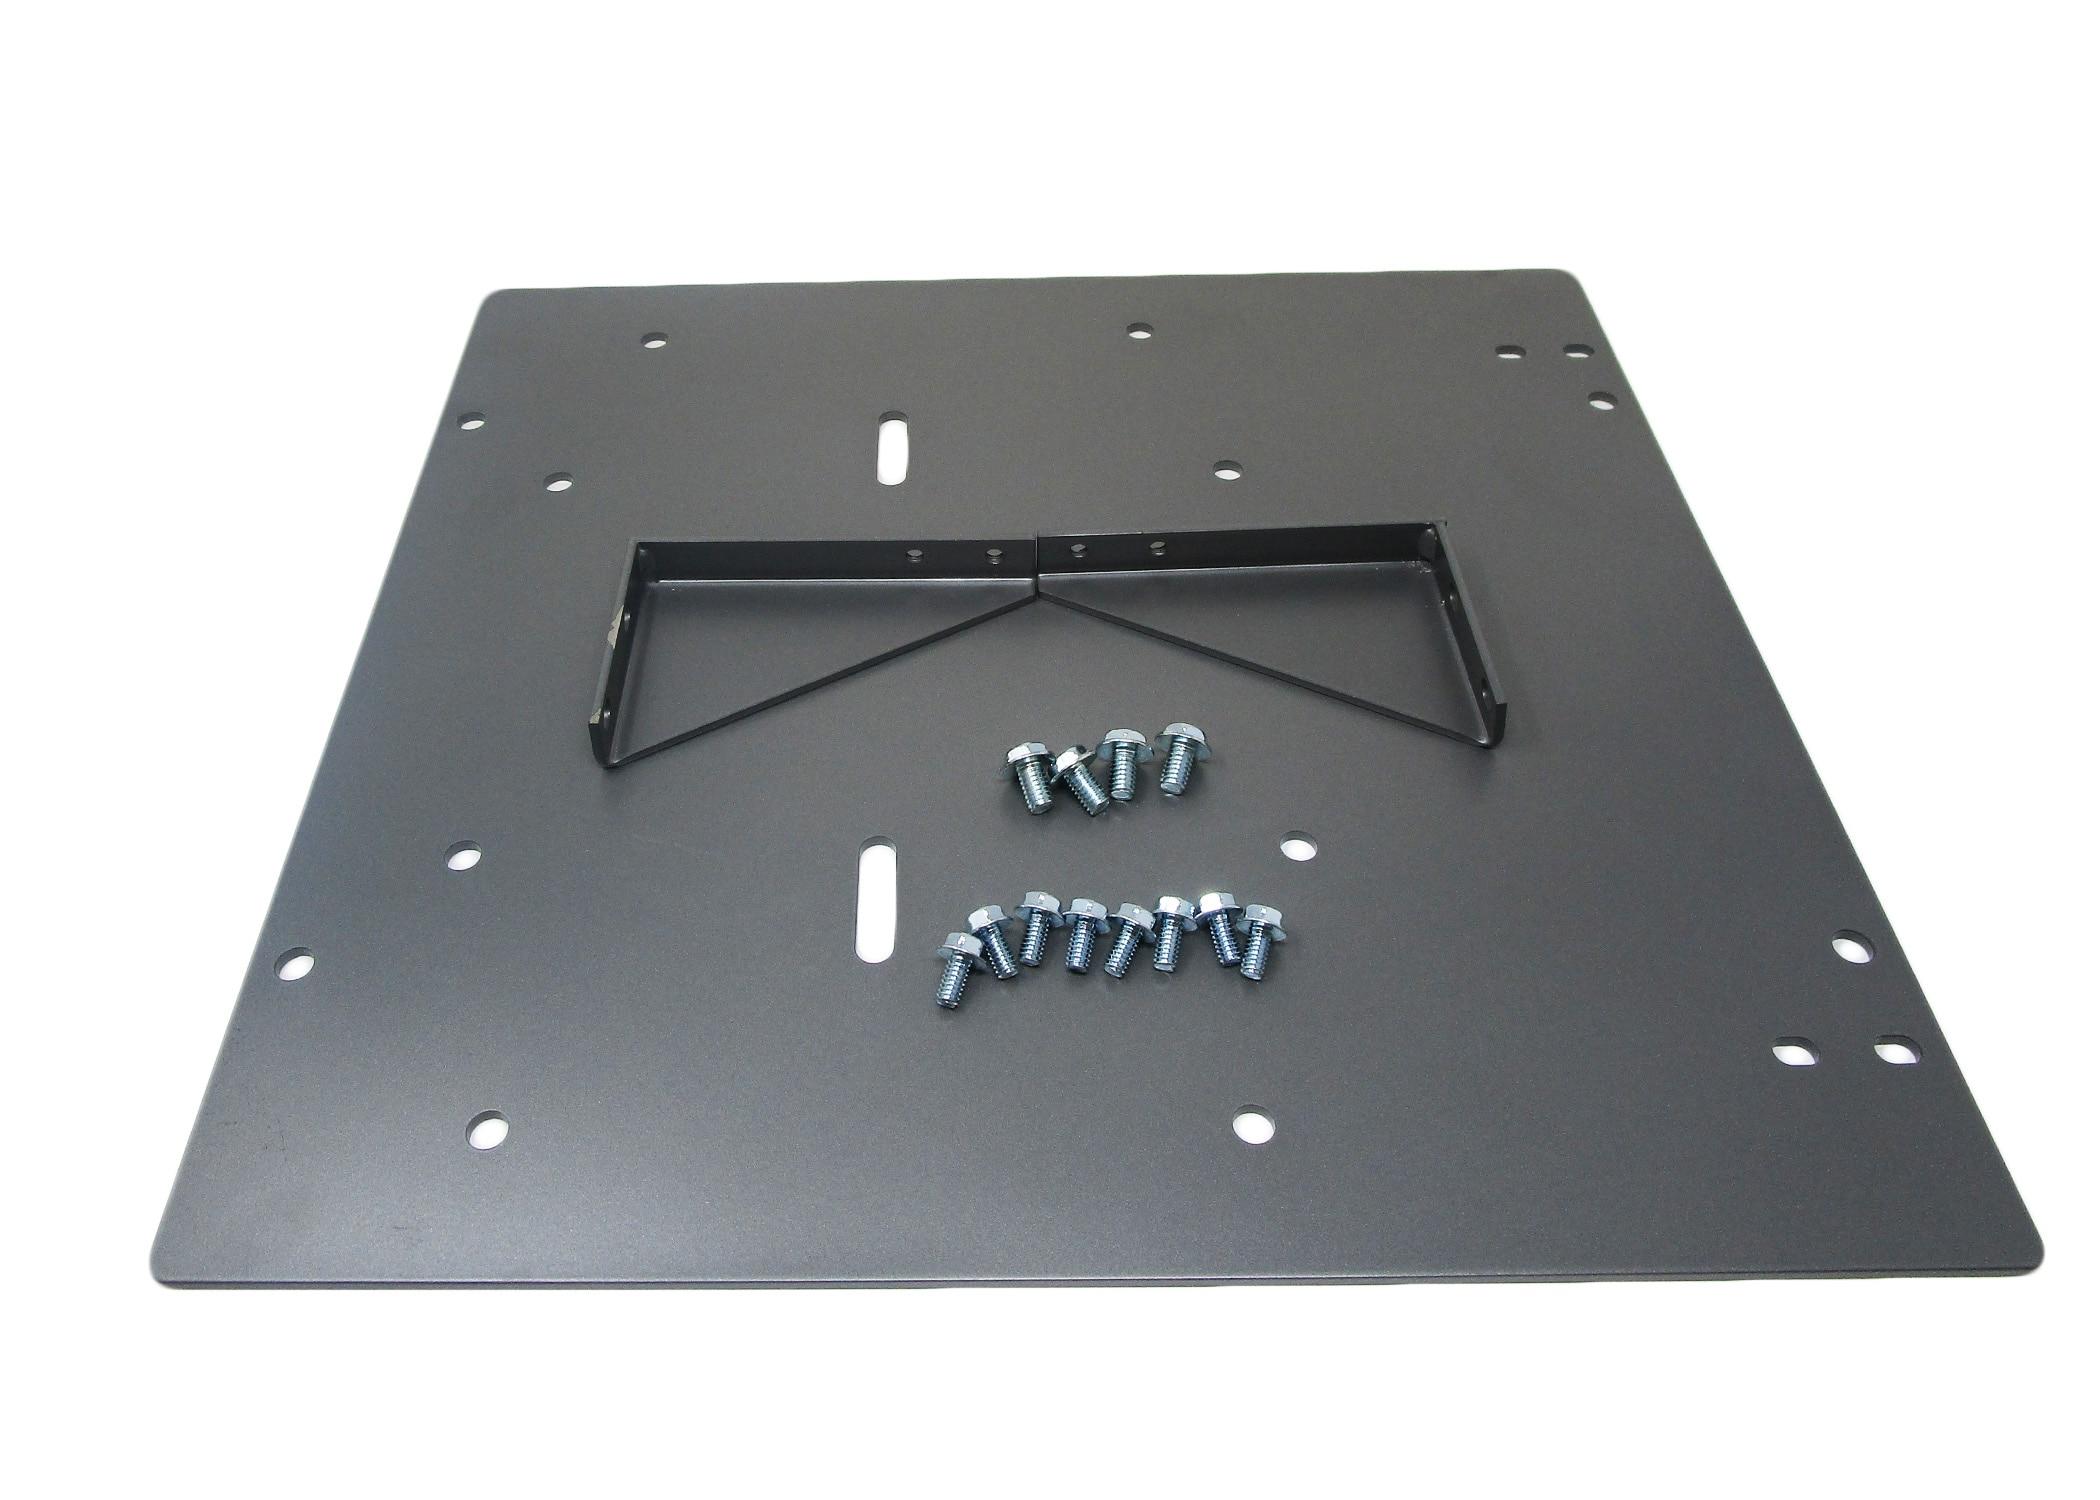 JDCS-505 Universal Adapter Plate